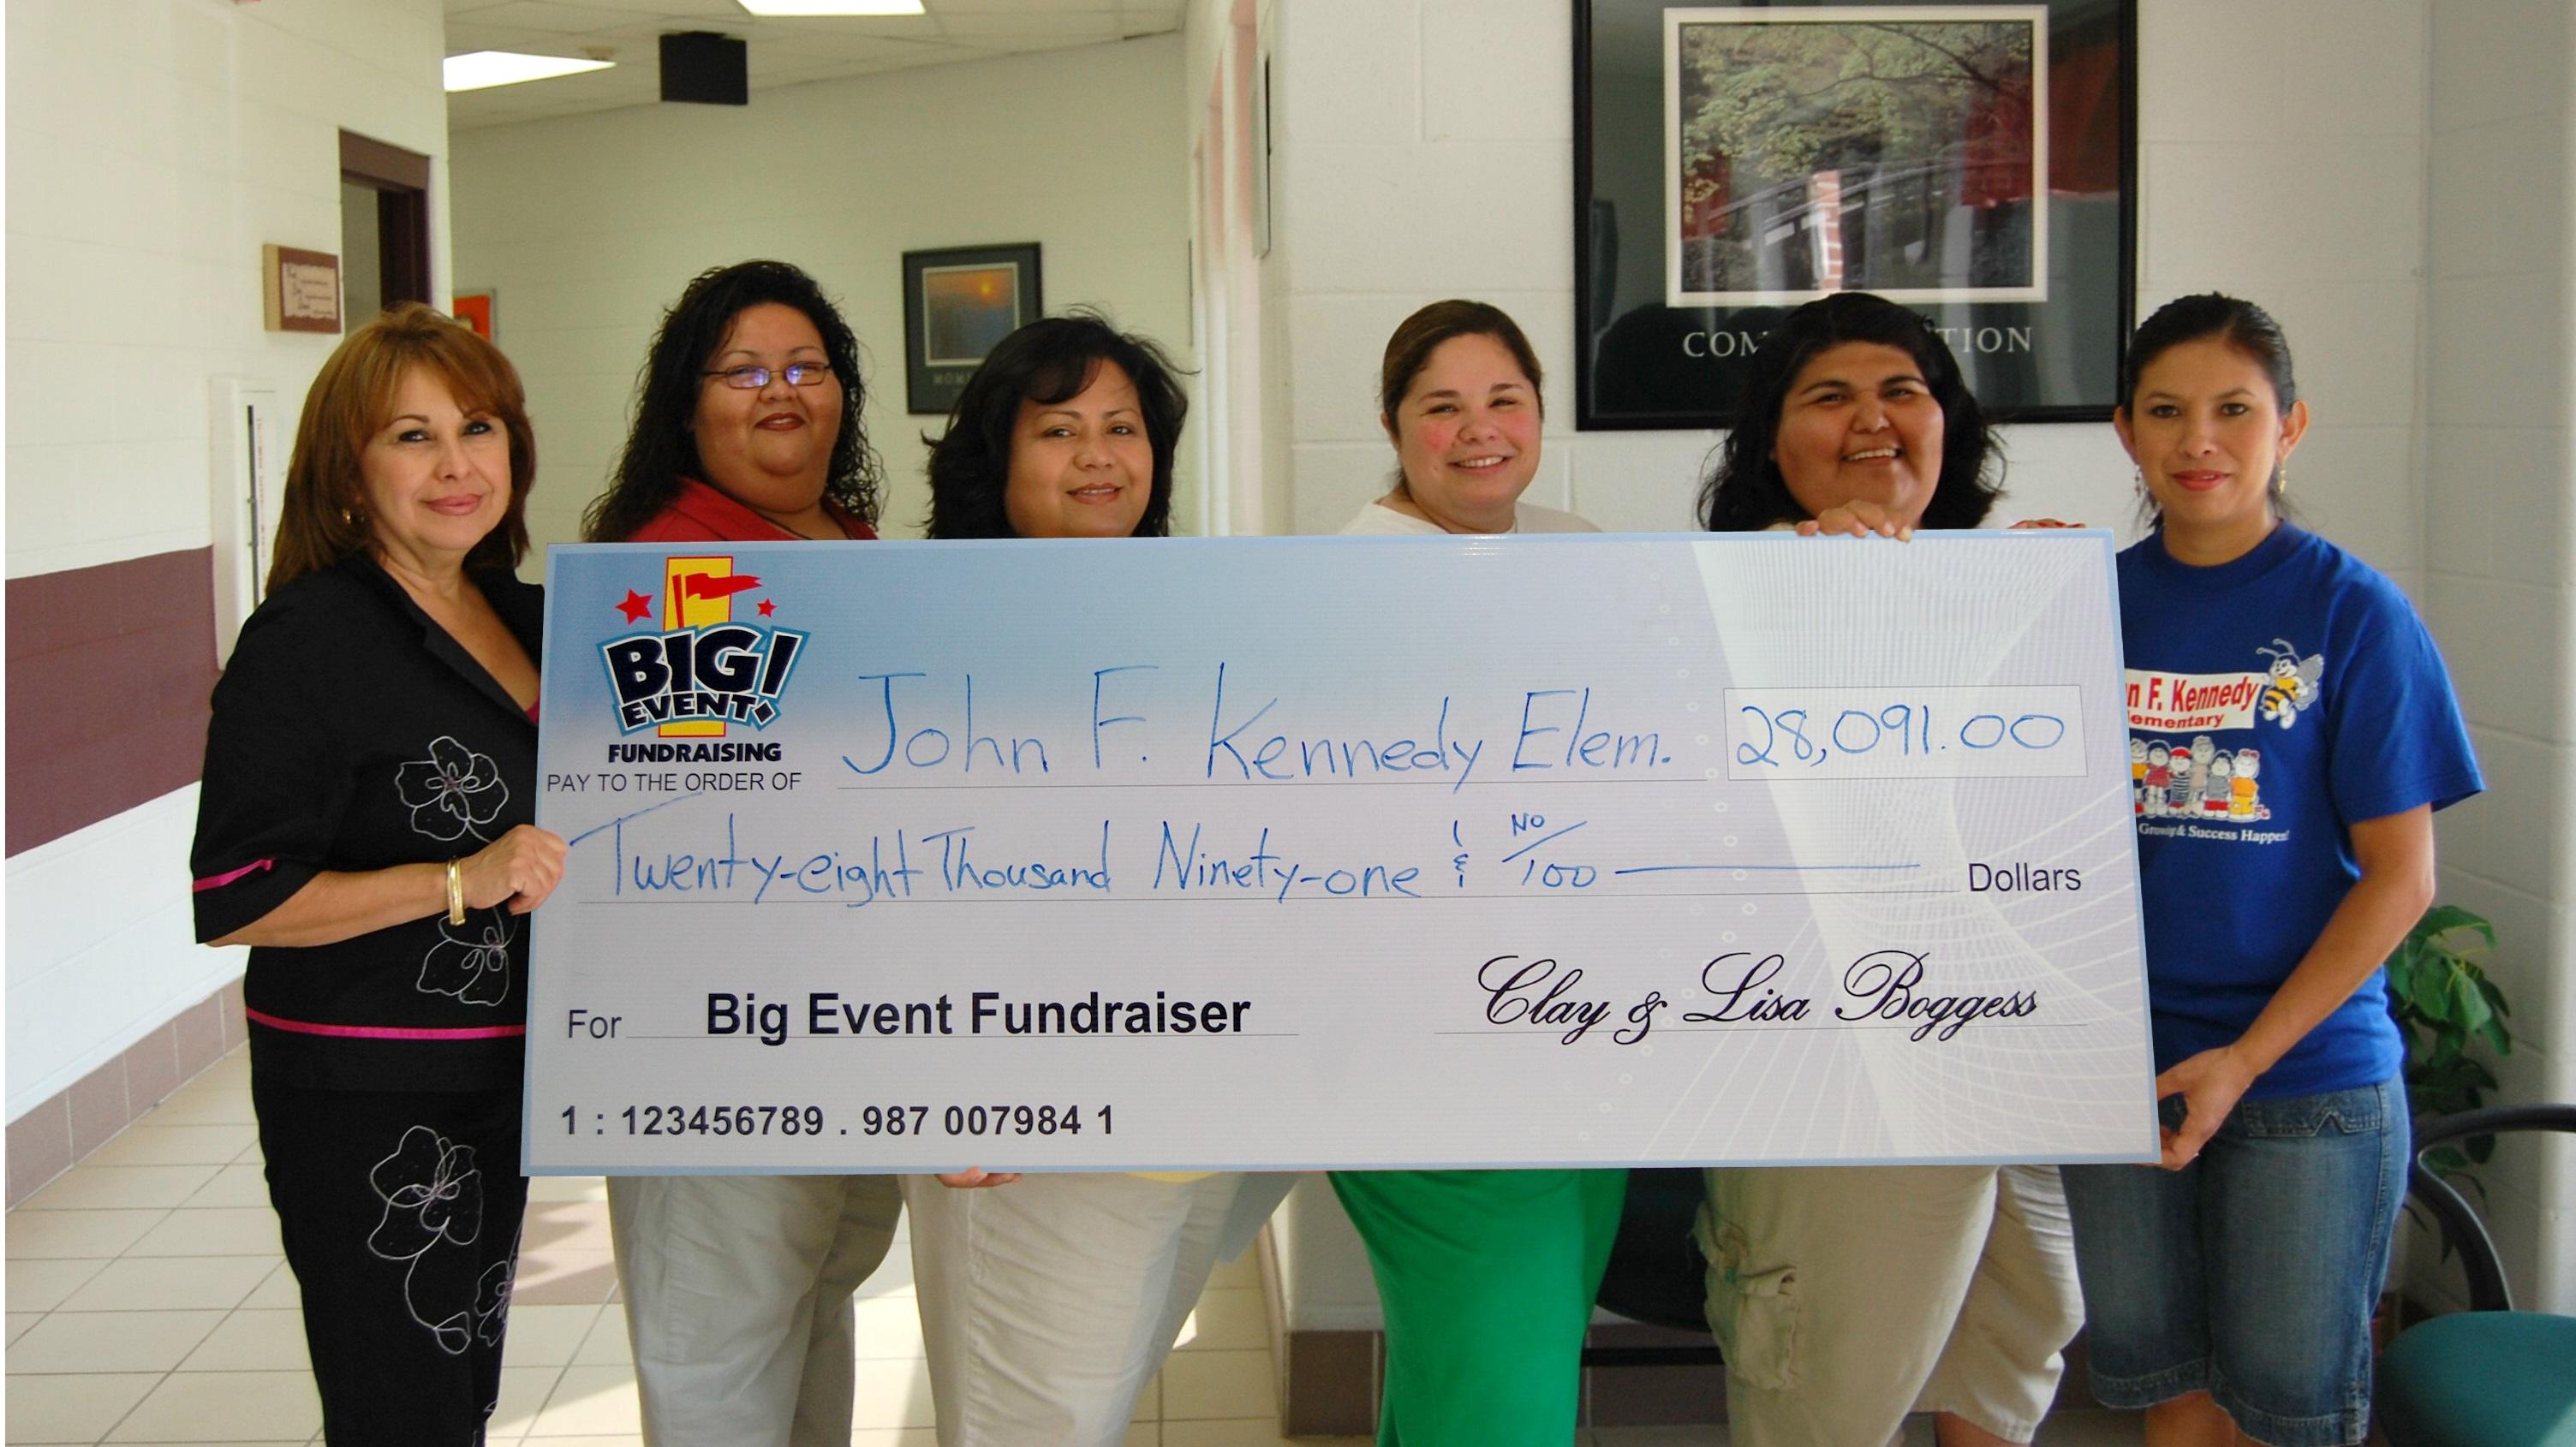 John F. Kennedy Elementary School fundraising team holding check